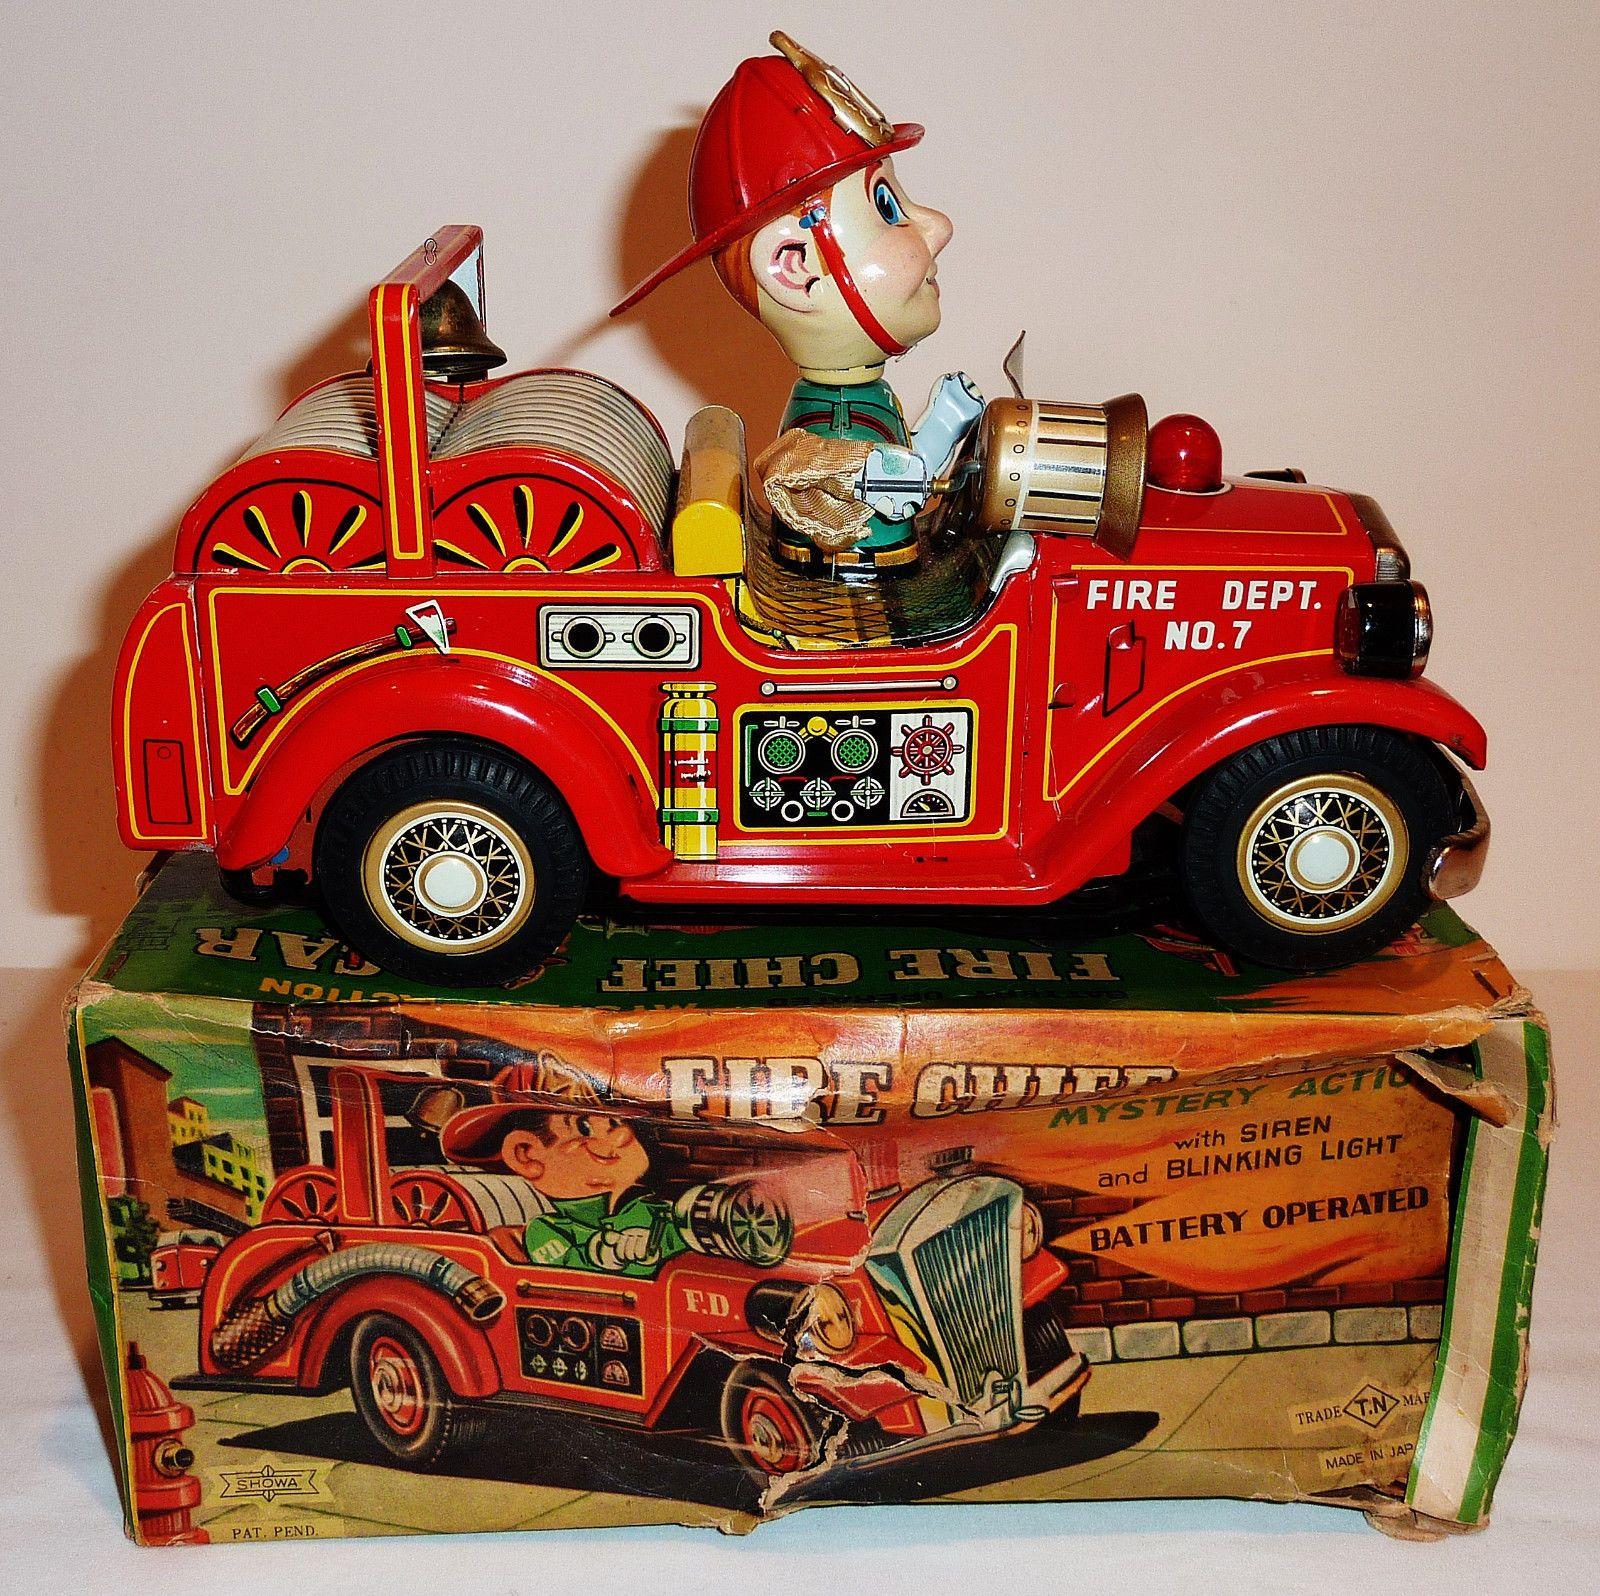 Nomra Fire Chief Car Batt Op toy from 50s ebay